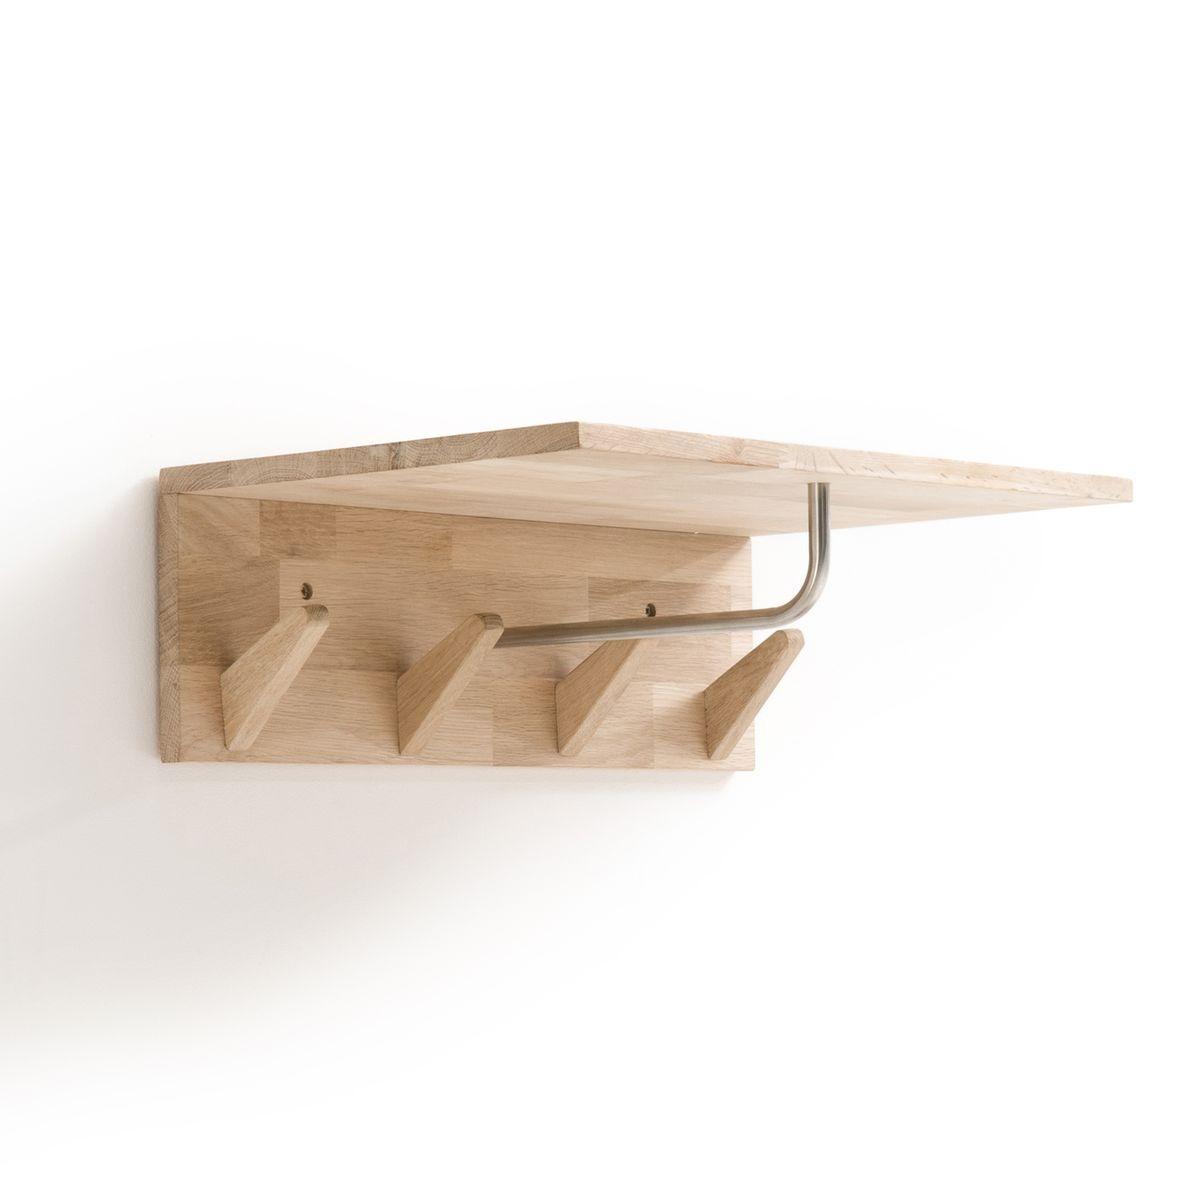 barre de penderie d30 x 15 mm ovale chrom 1 m vendu par leroy merlin 426149. Black Bedroom Furniture Sets. Home Design Ideas